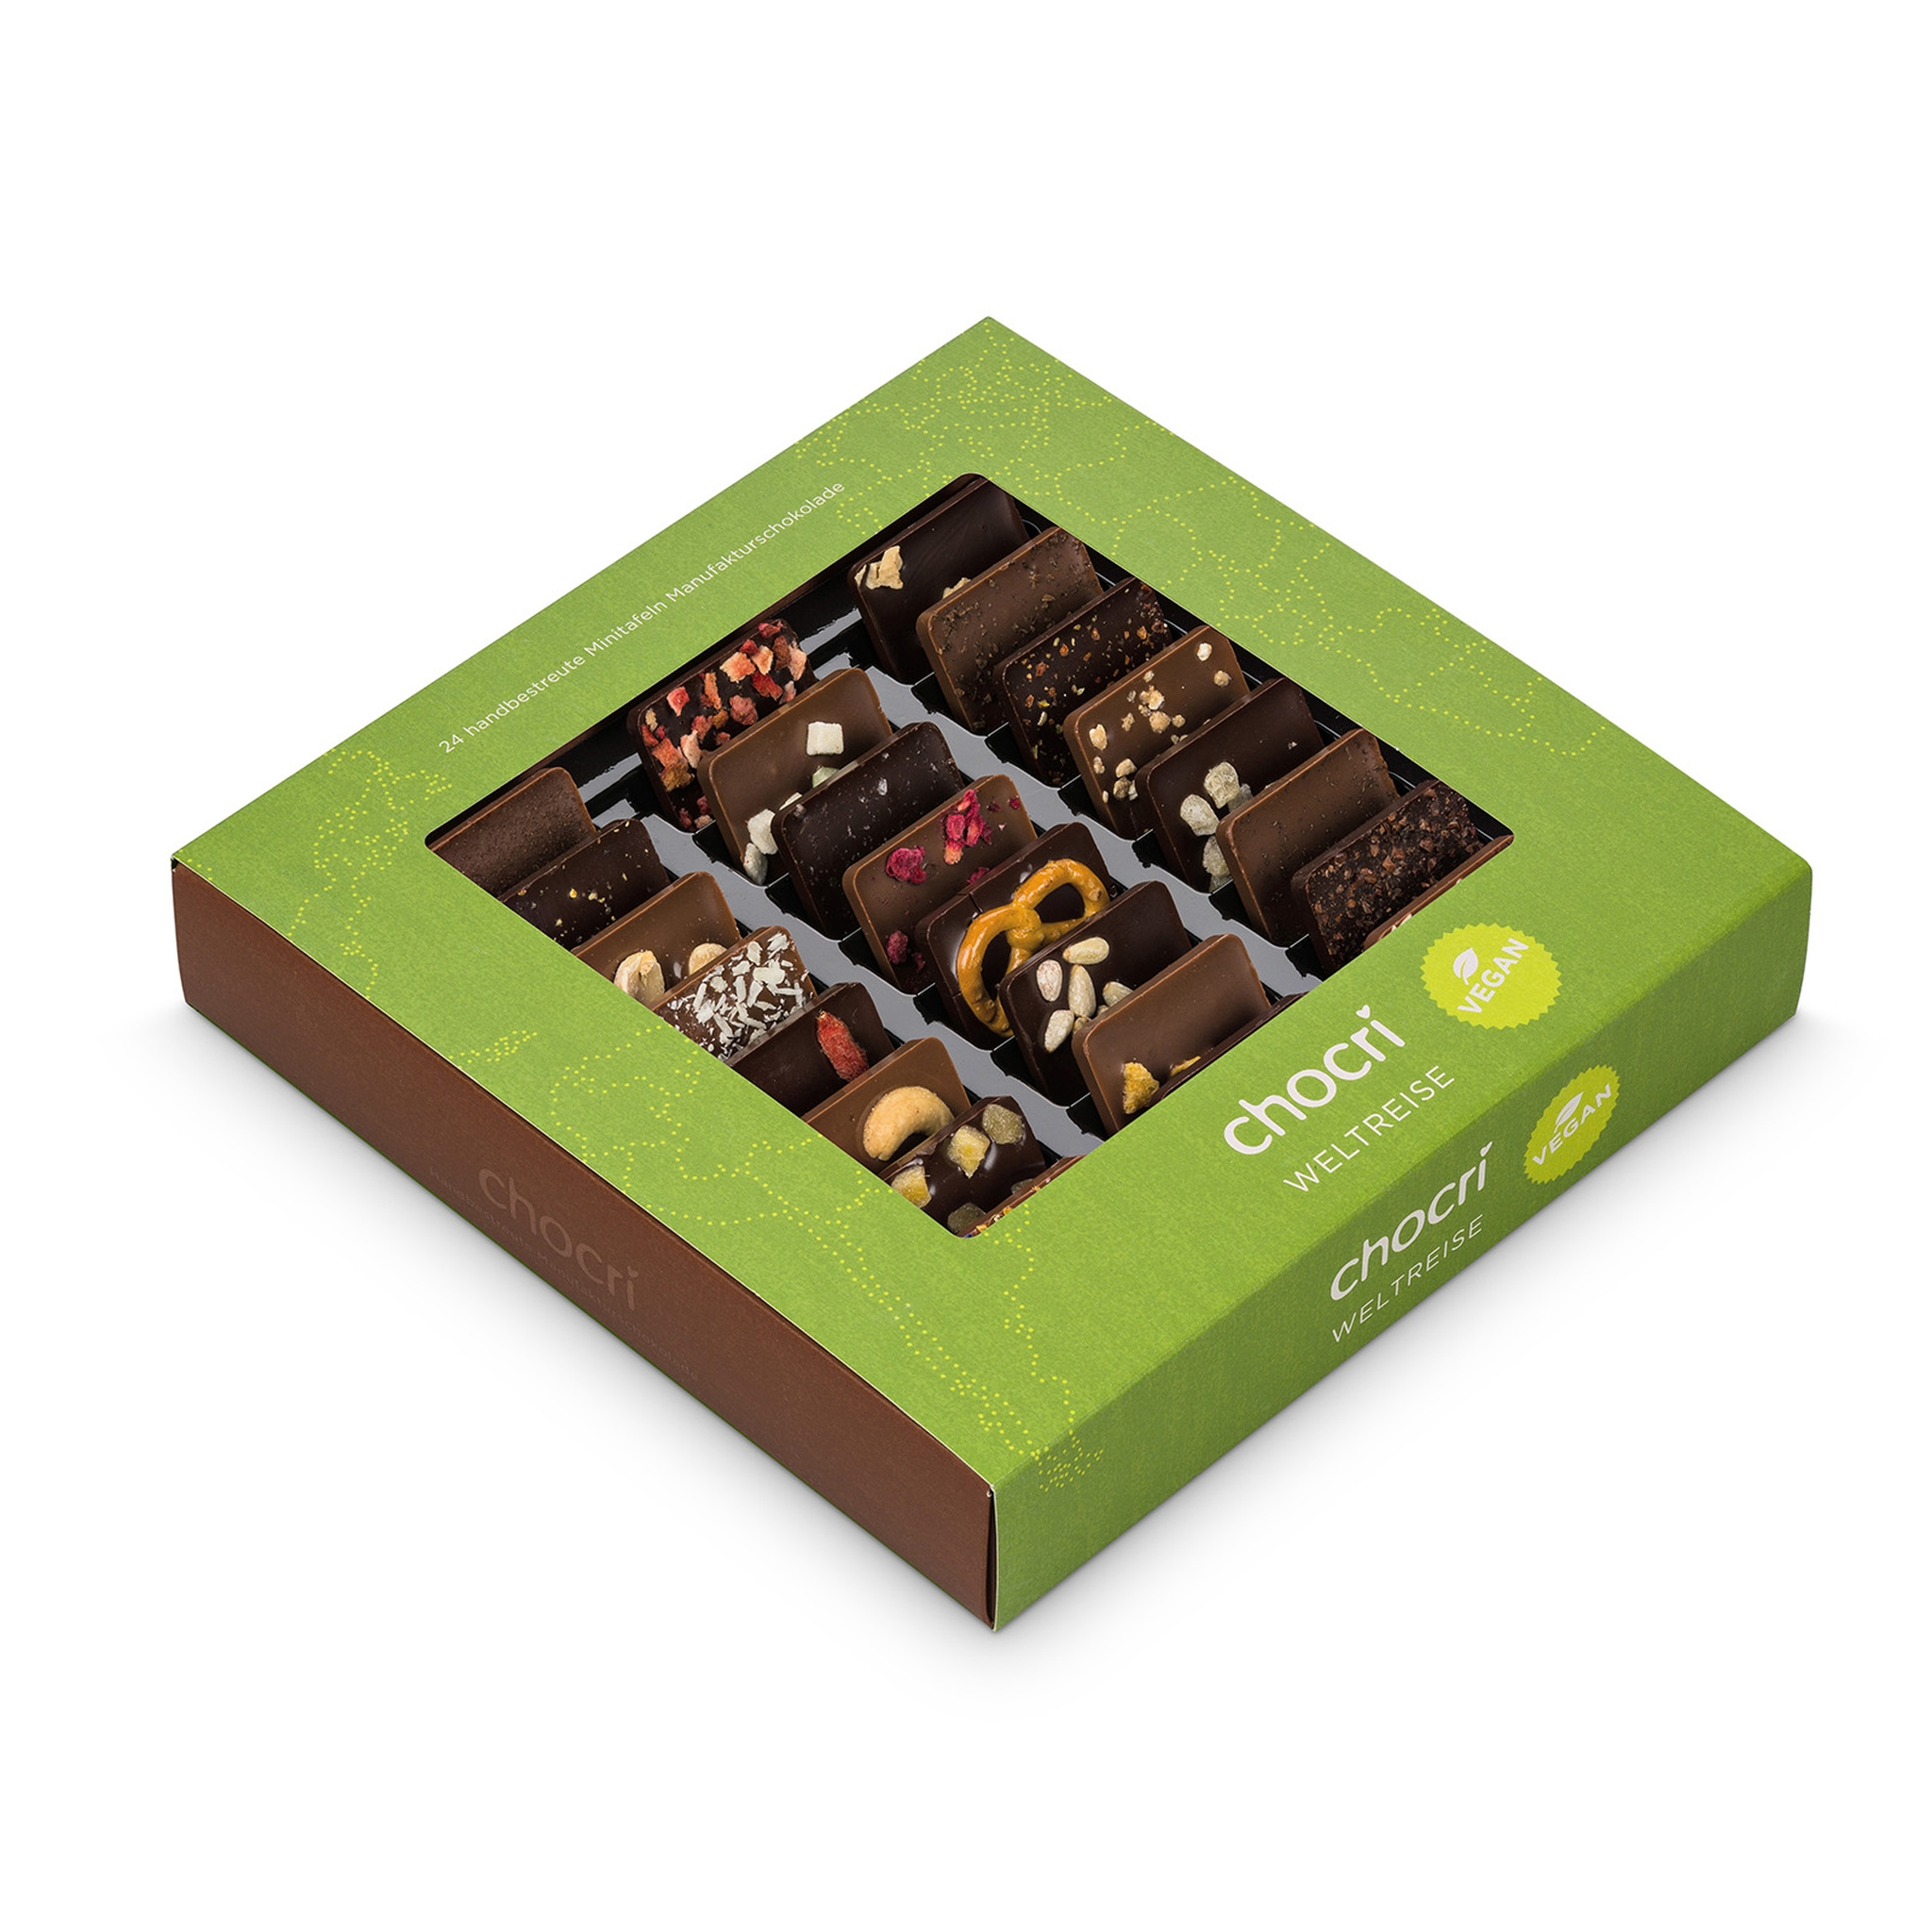 Köstlichsüsses - chocri Weltreise® 'Vegan' Mini Schokoladentafeln - Onlineshop Chocri